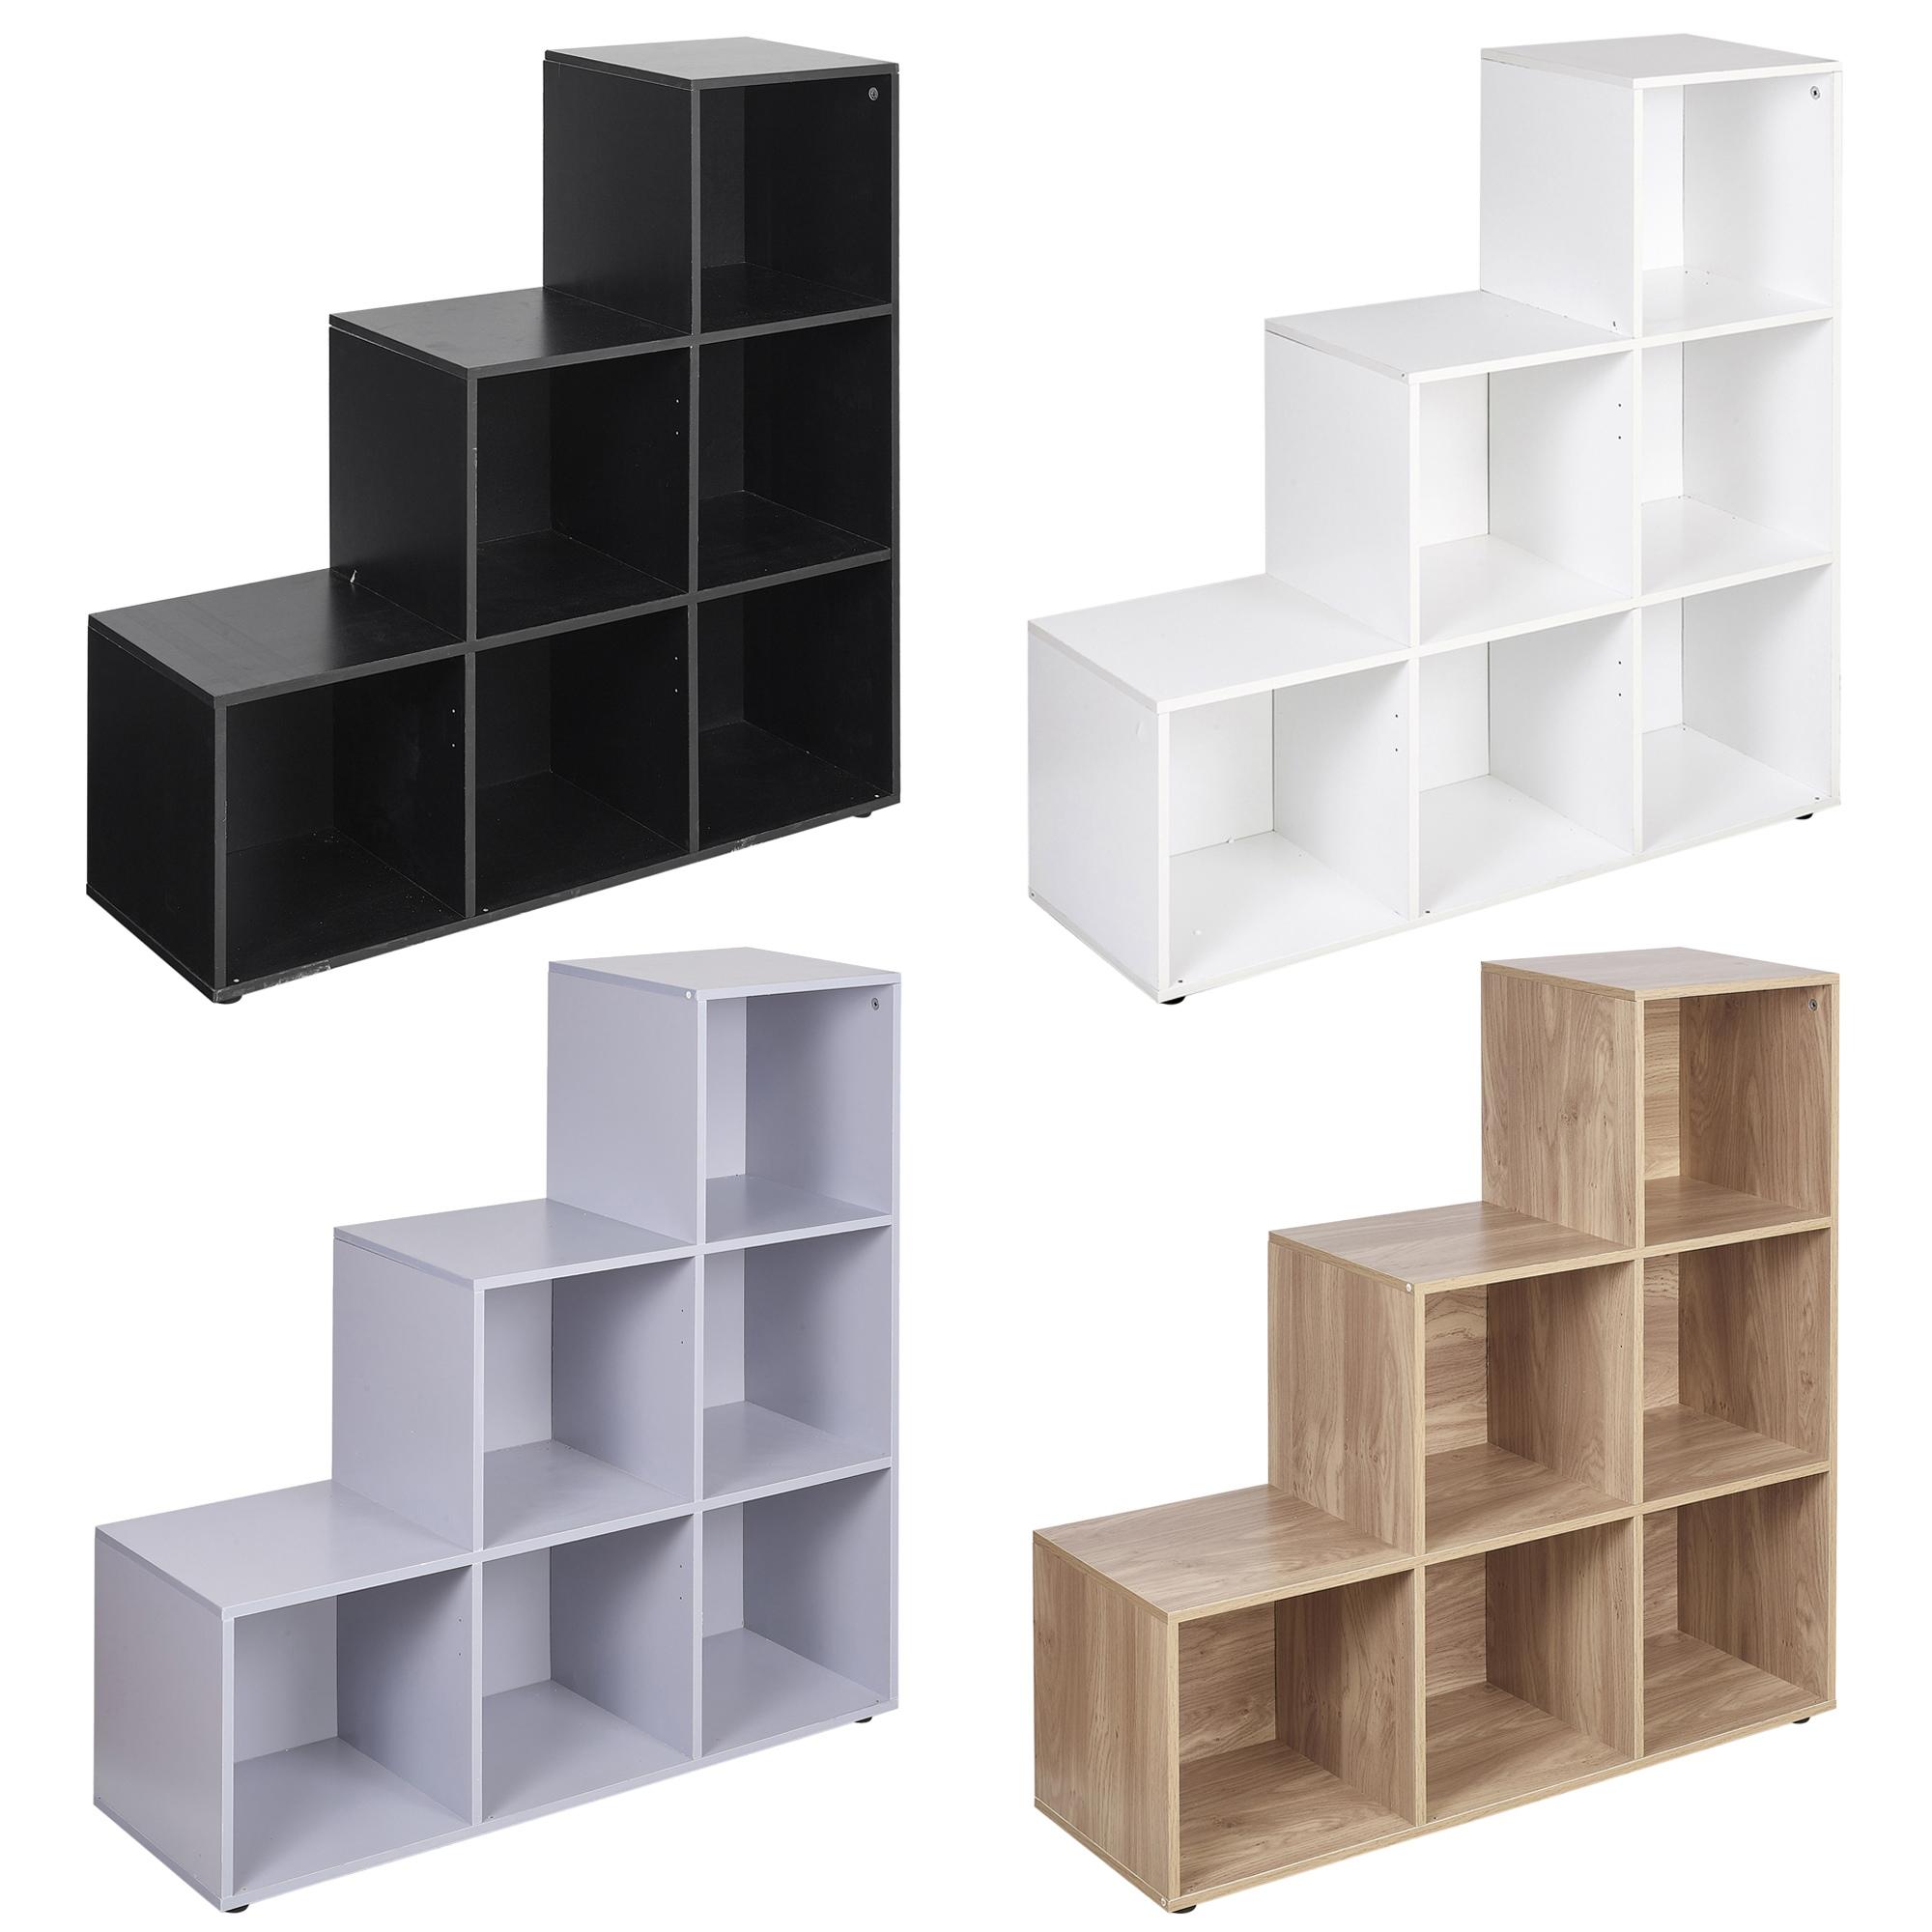 6 Cube Step Storage Bookcase Unit Shelf Home Office Organiser Display Box New Ebay